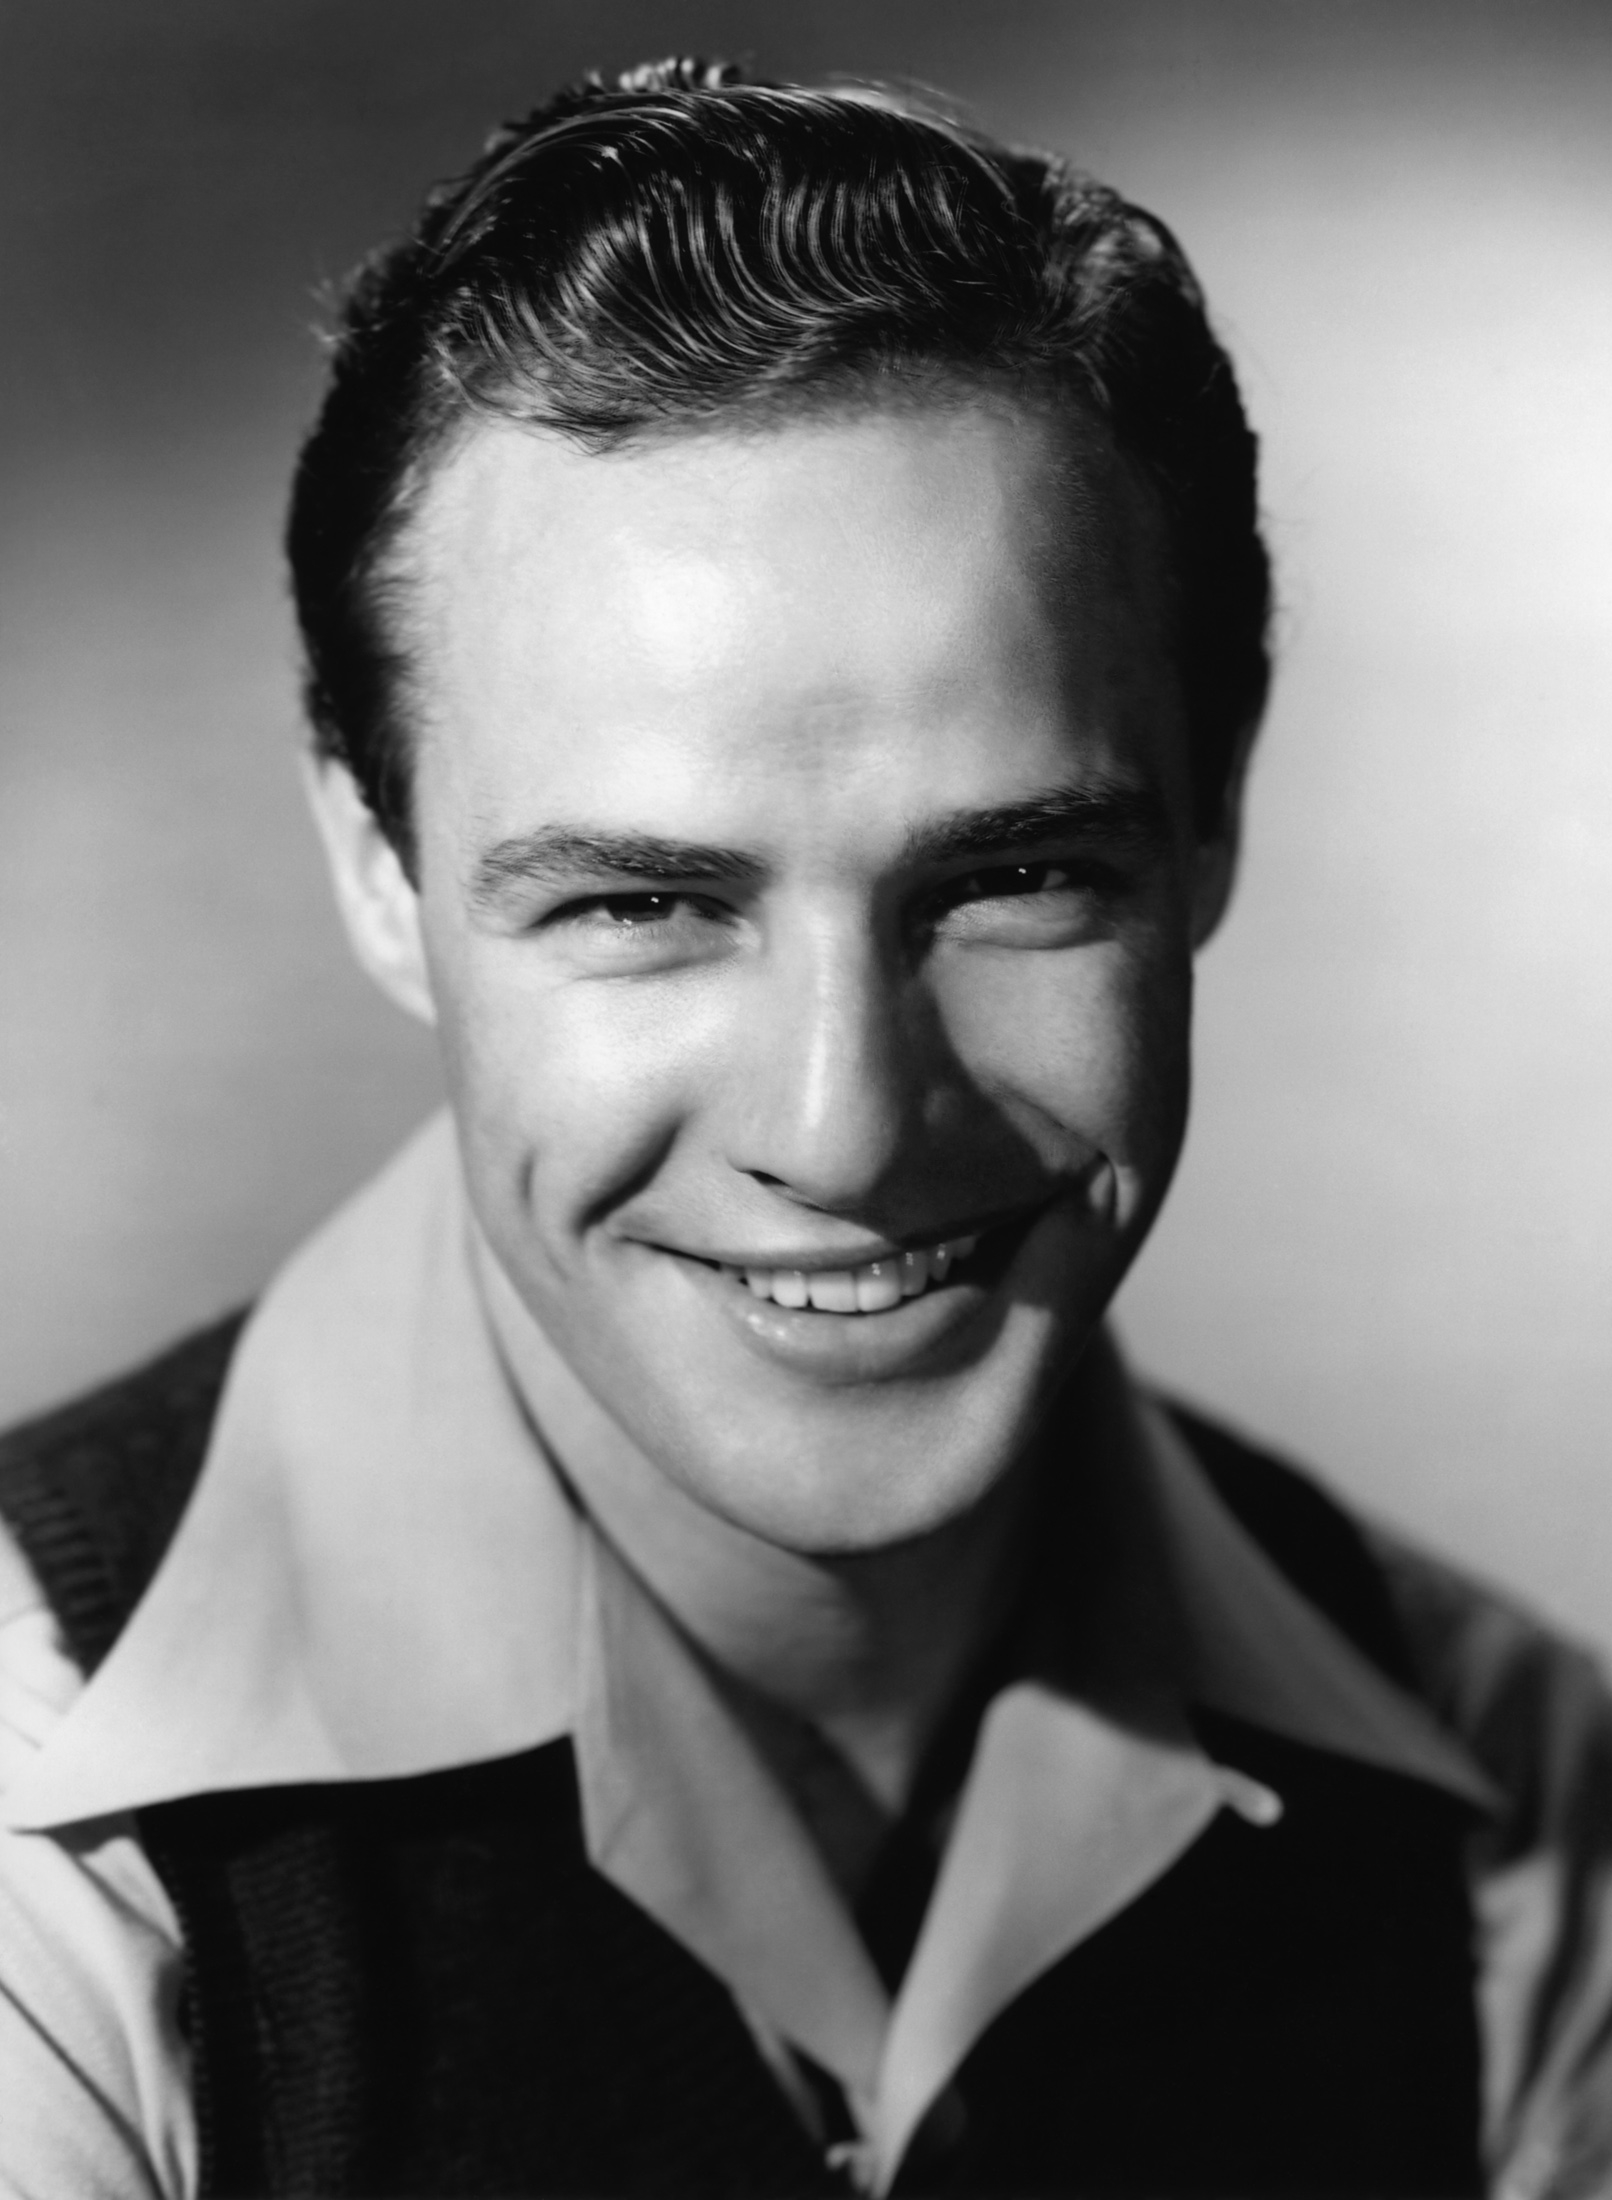 File:Marlon Brando in The Men.jpg - Wikimedia Commons